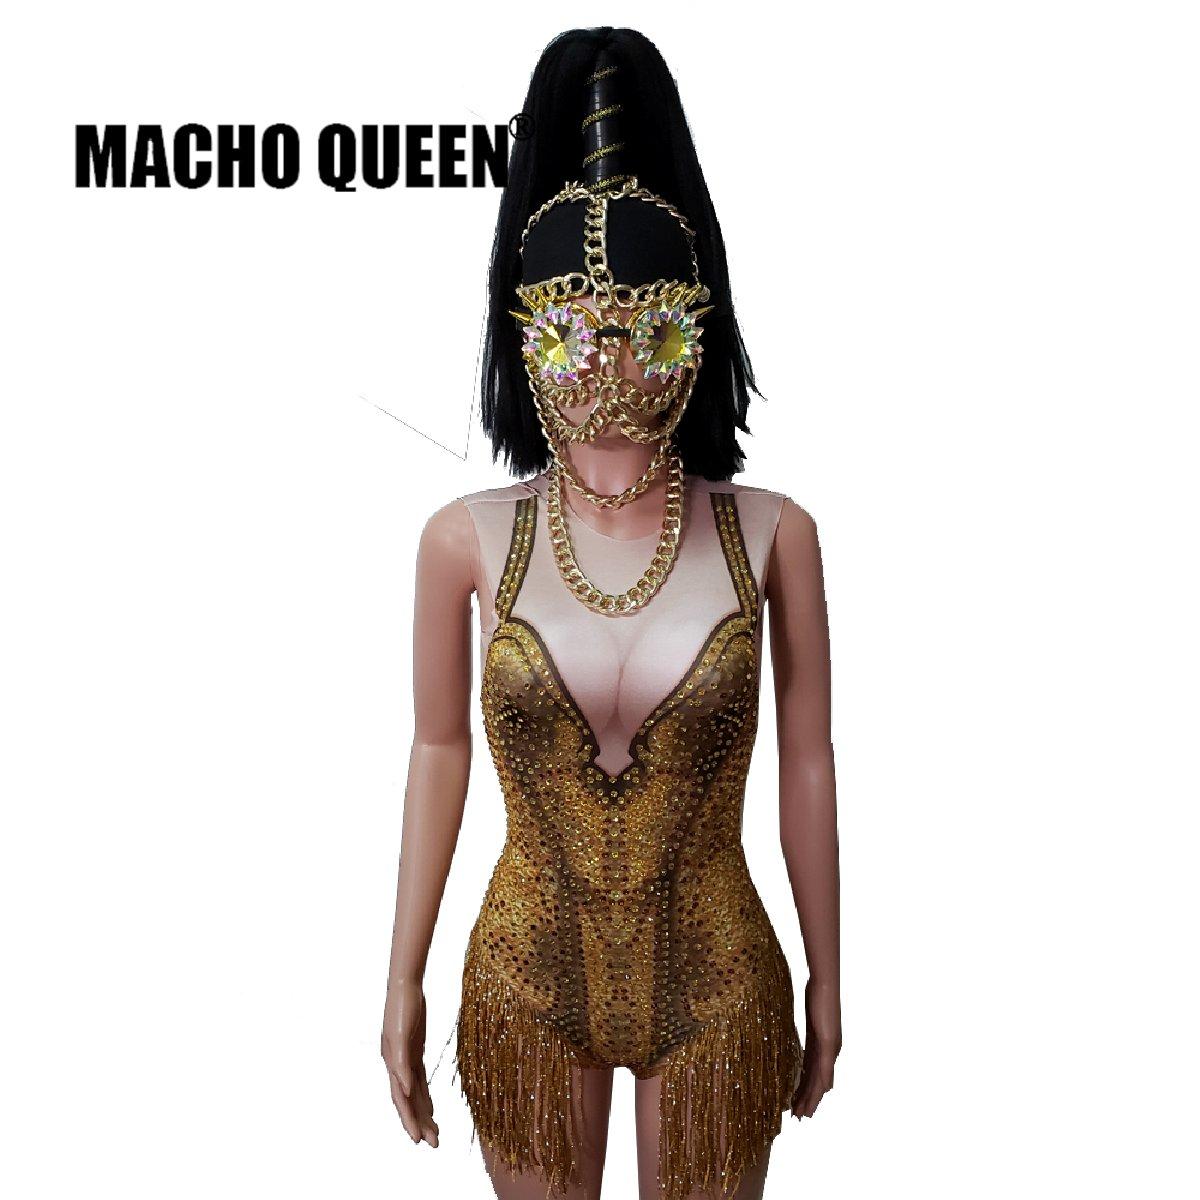 Mono de flecos con diamantes de imitación dorados, mono de cristal para Hombre Ardiente, Dra Queen, vestido de baile latino para mujer, Atuendo para cantante de escenario